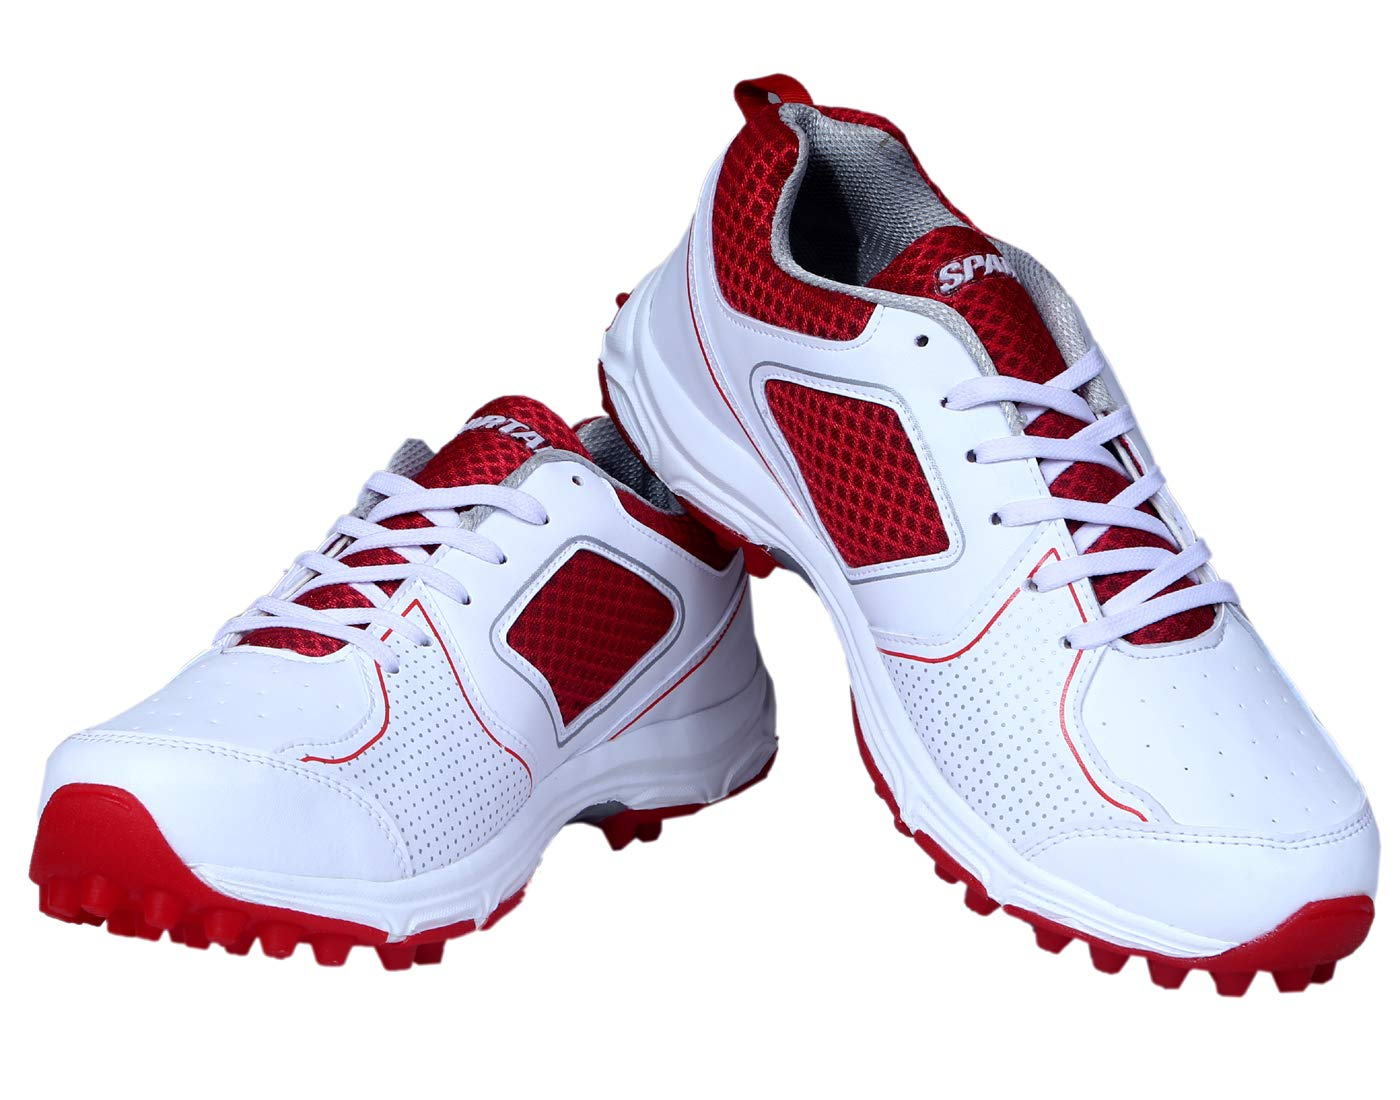 Spartan ECO Cricket Shoes for Men